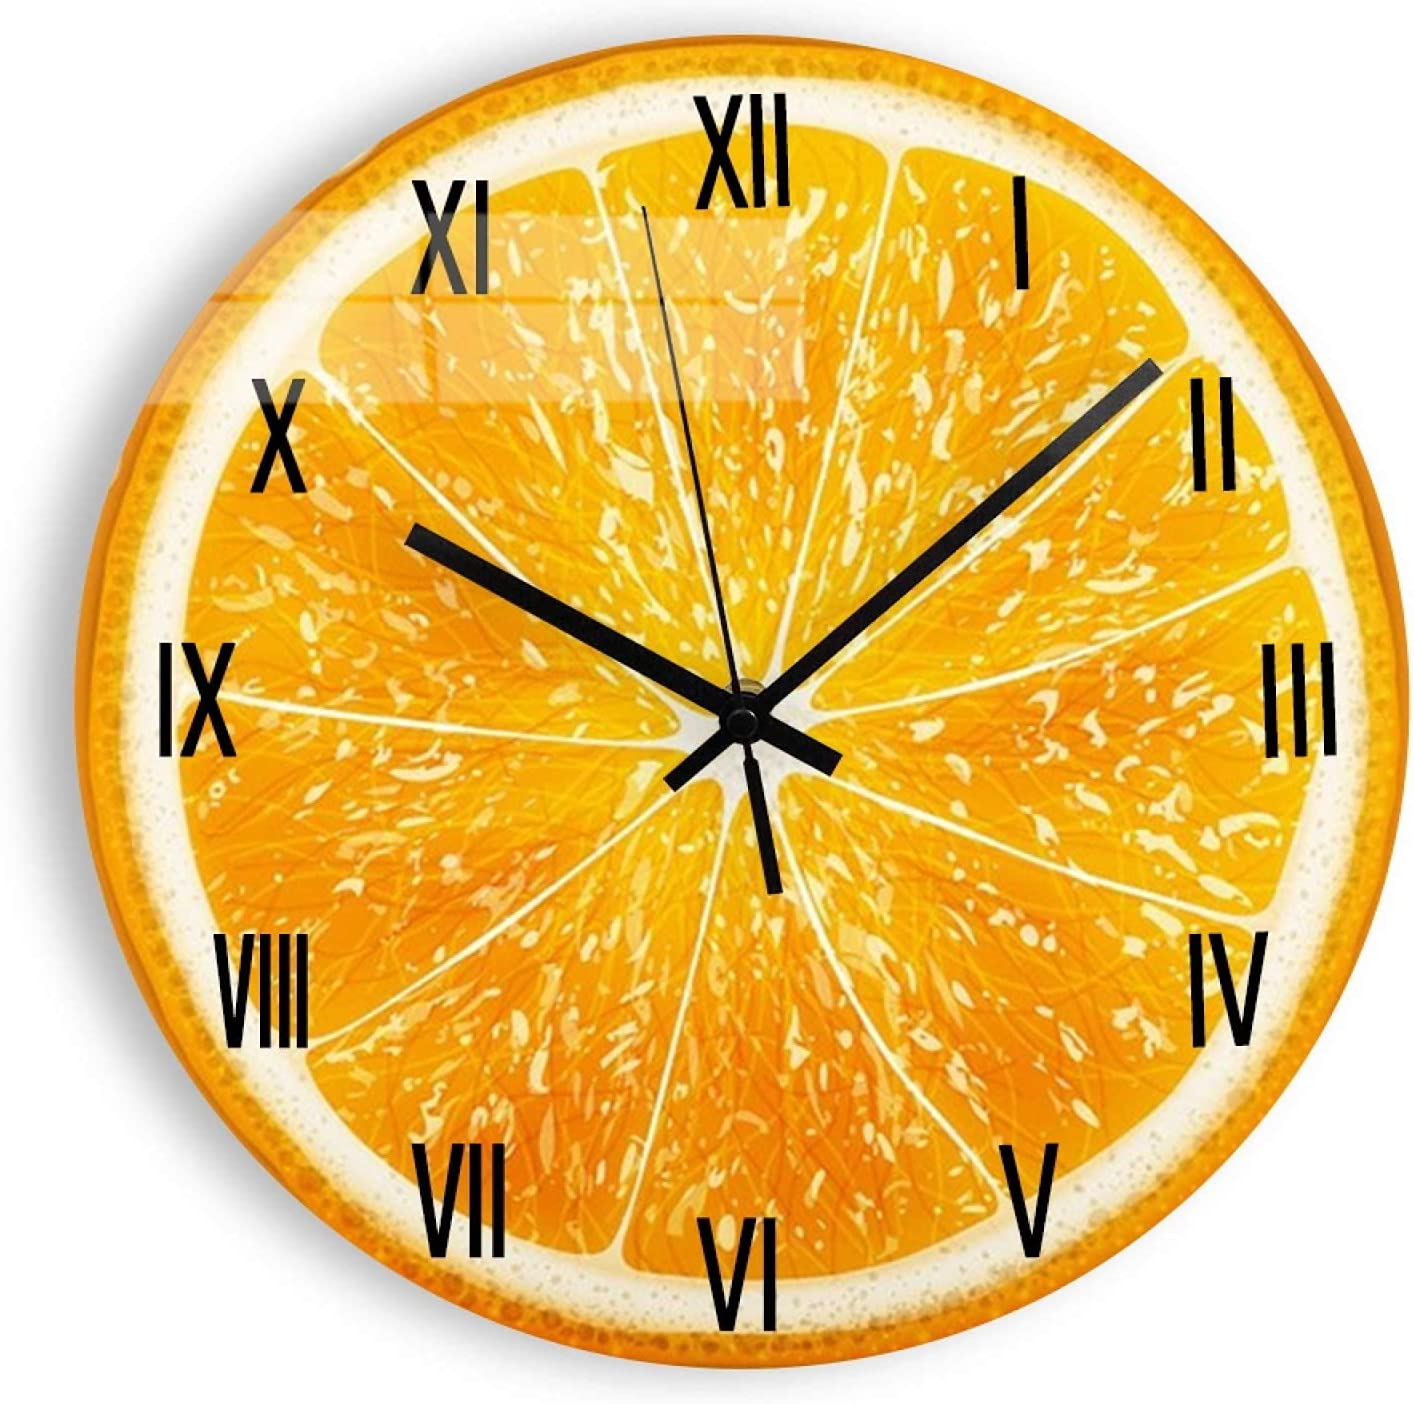 DKISEE Wooden Non Ticking Mesa free Mall Wall Clock Design Lemon ruits R Modern